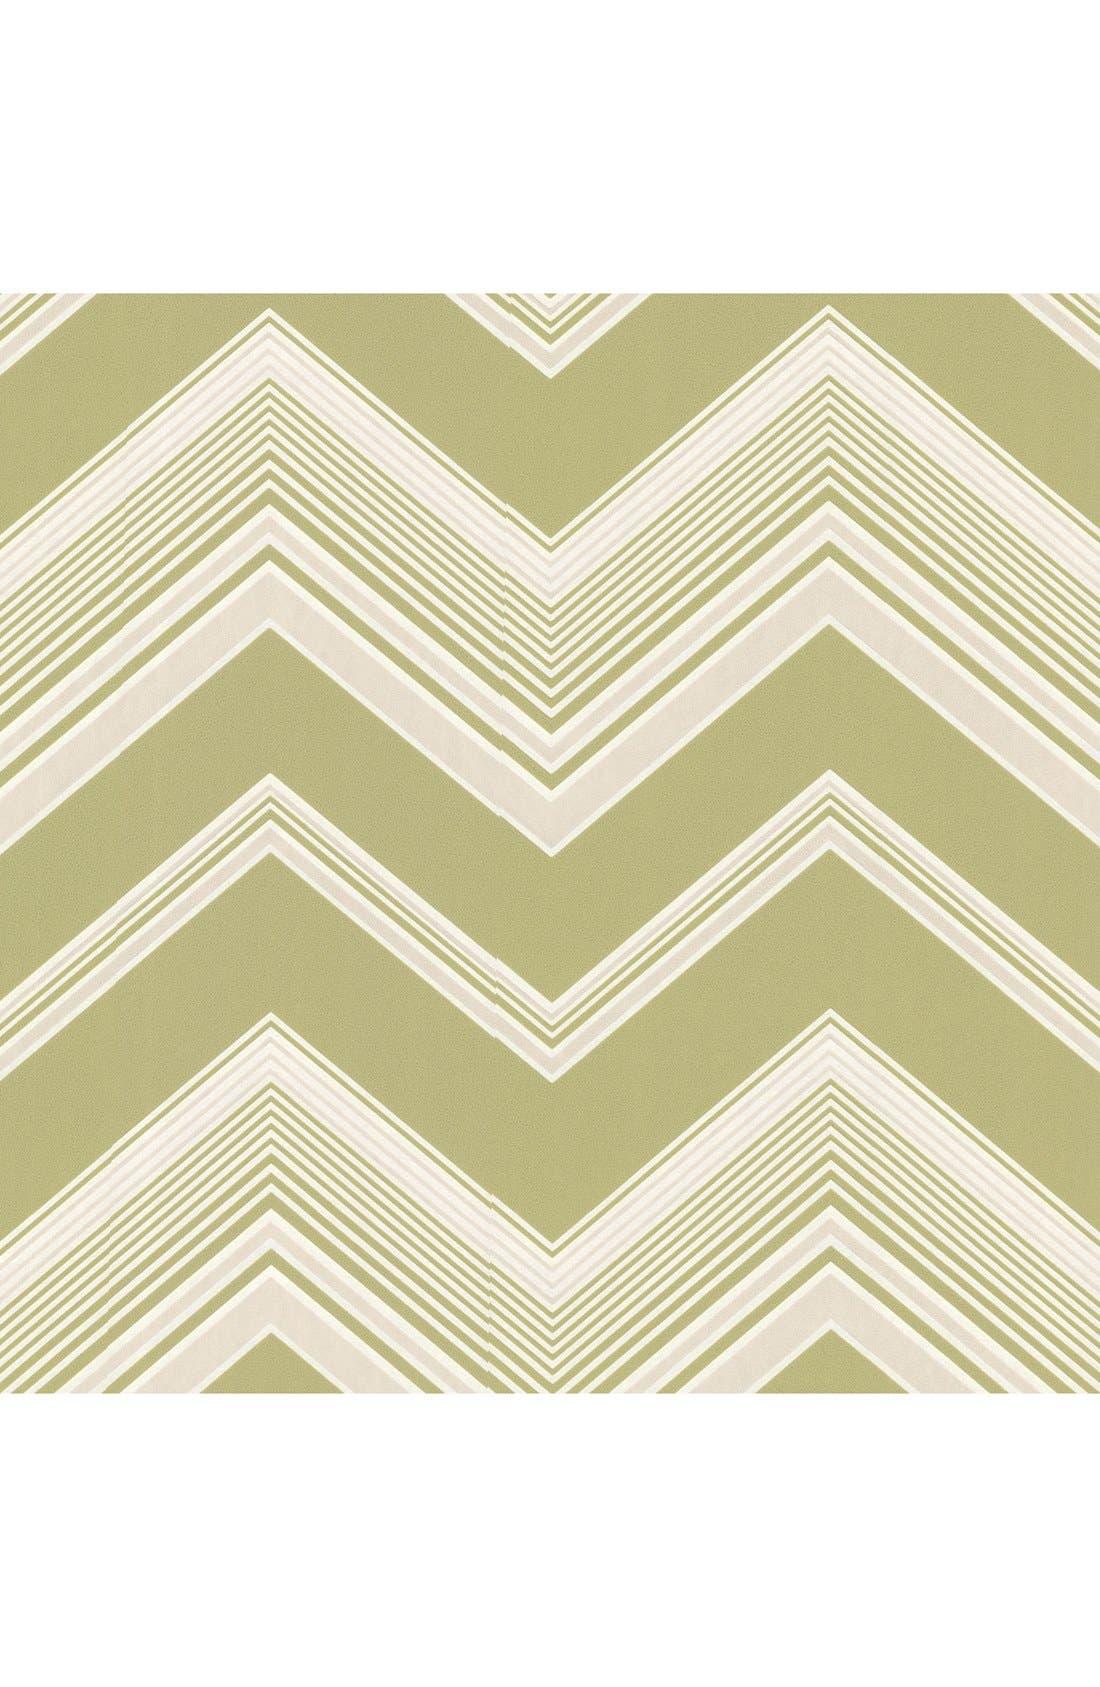 'Bearden Light - Zigzag' Unpasted Wallpaper,                             Main thumbnail 1, color,                             Green